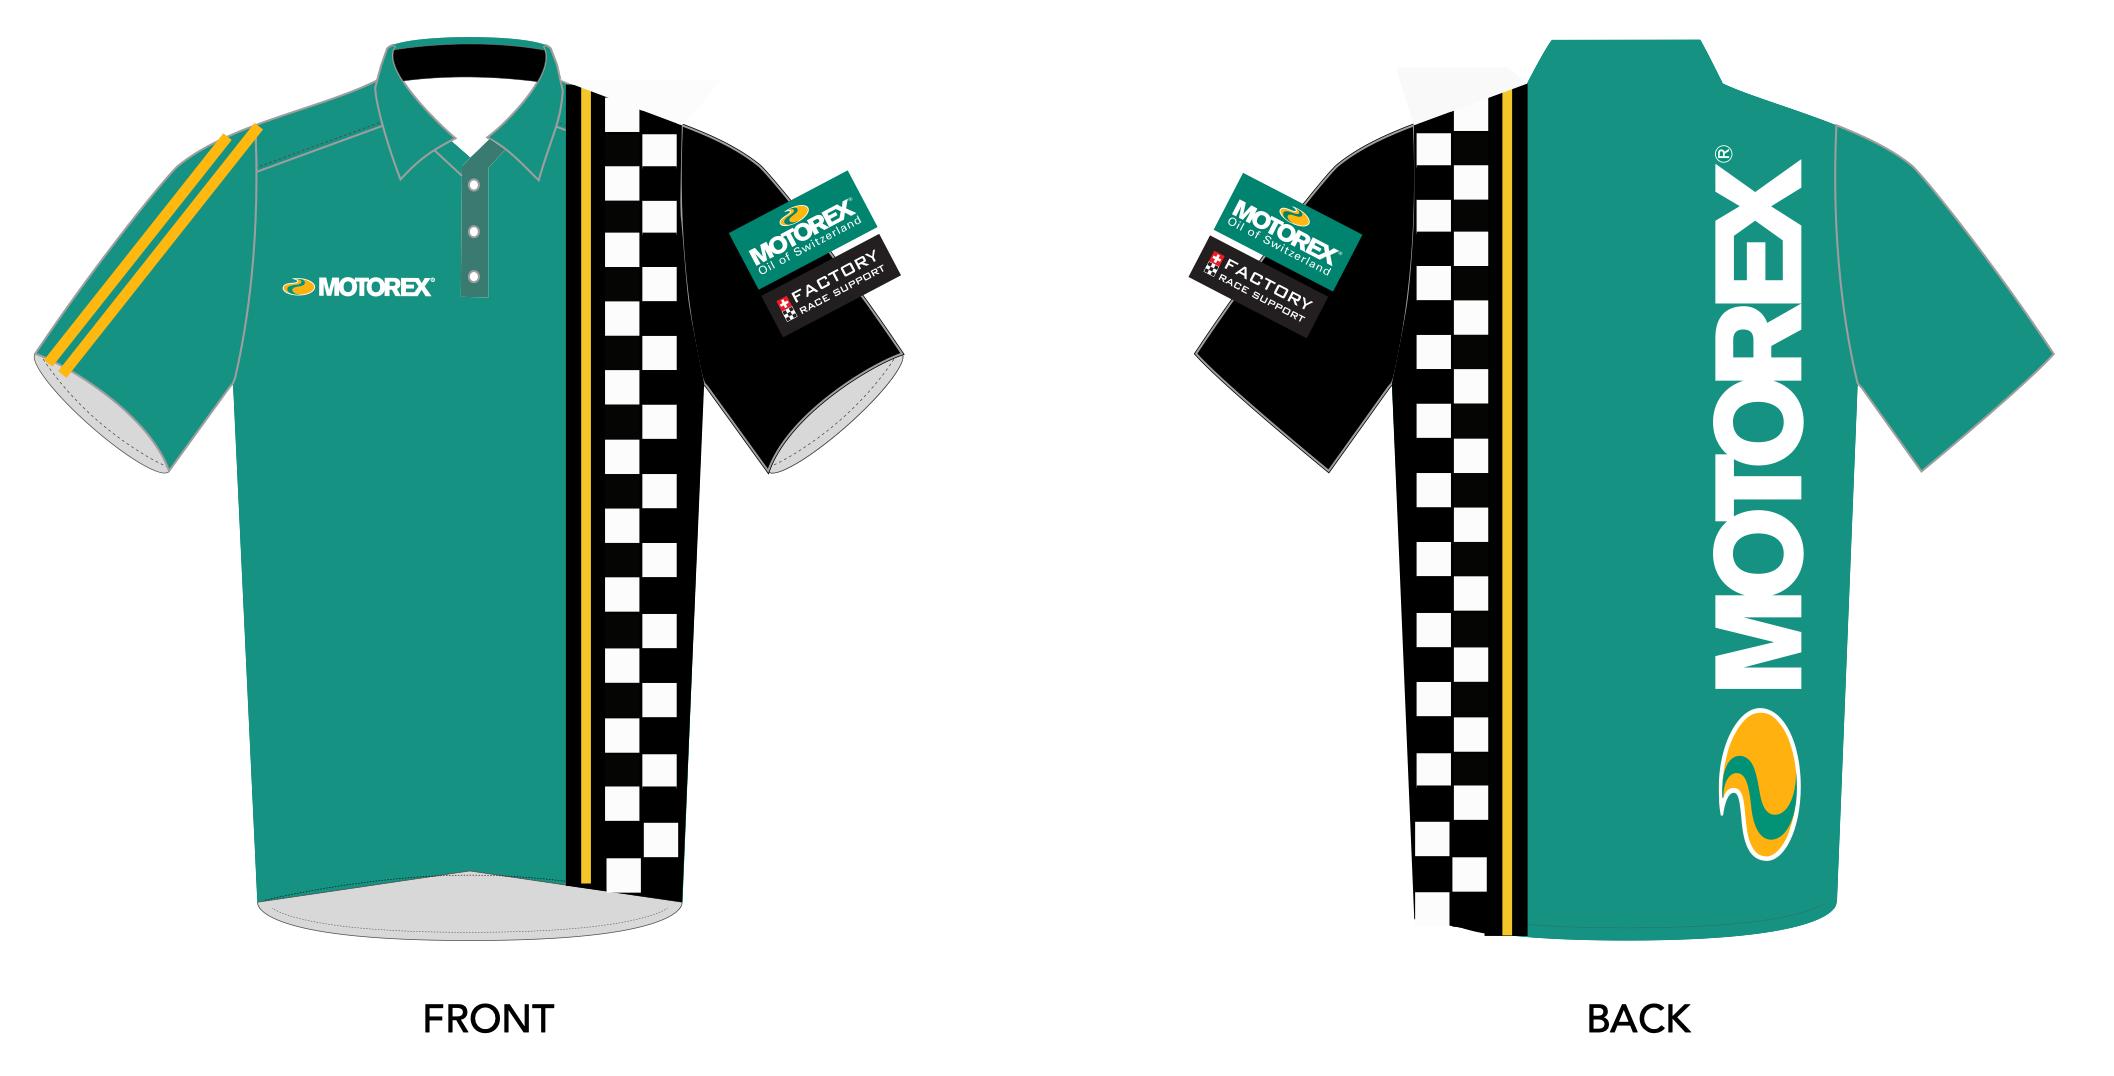 Motorex Racing clothes